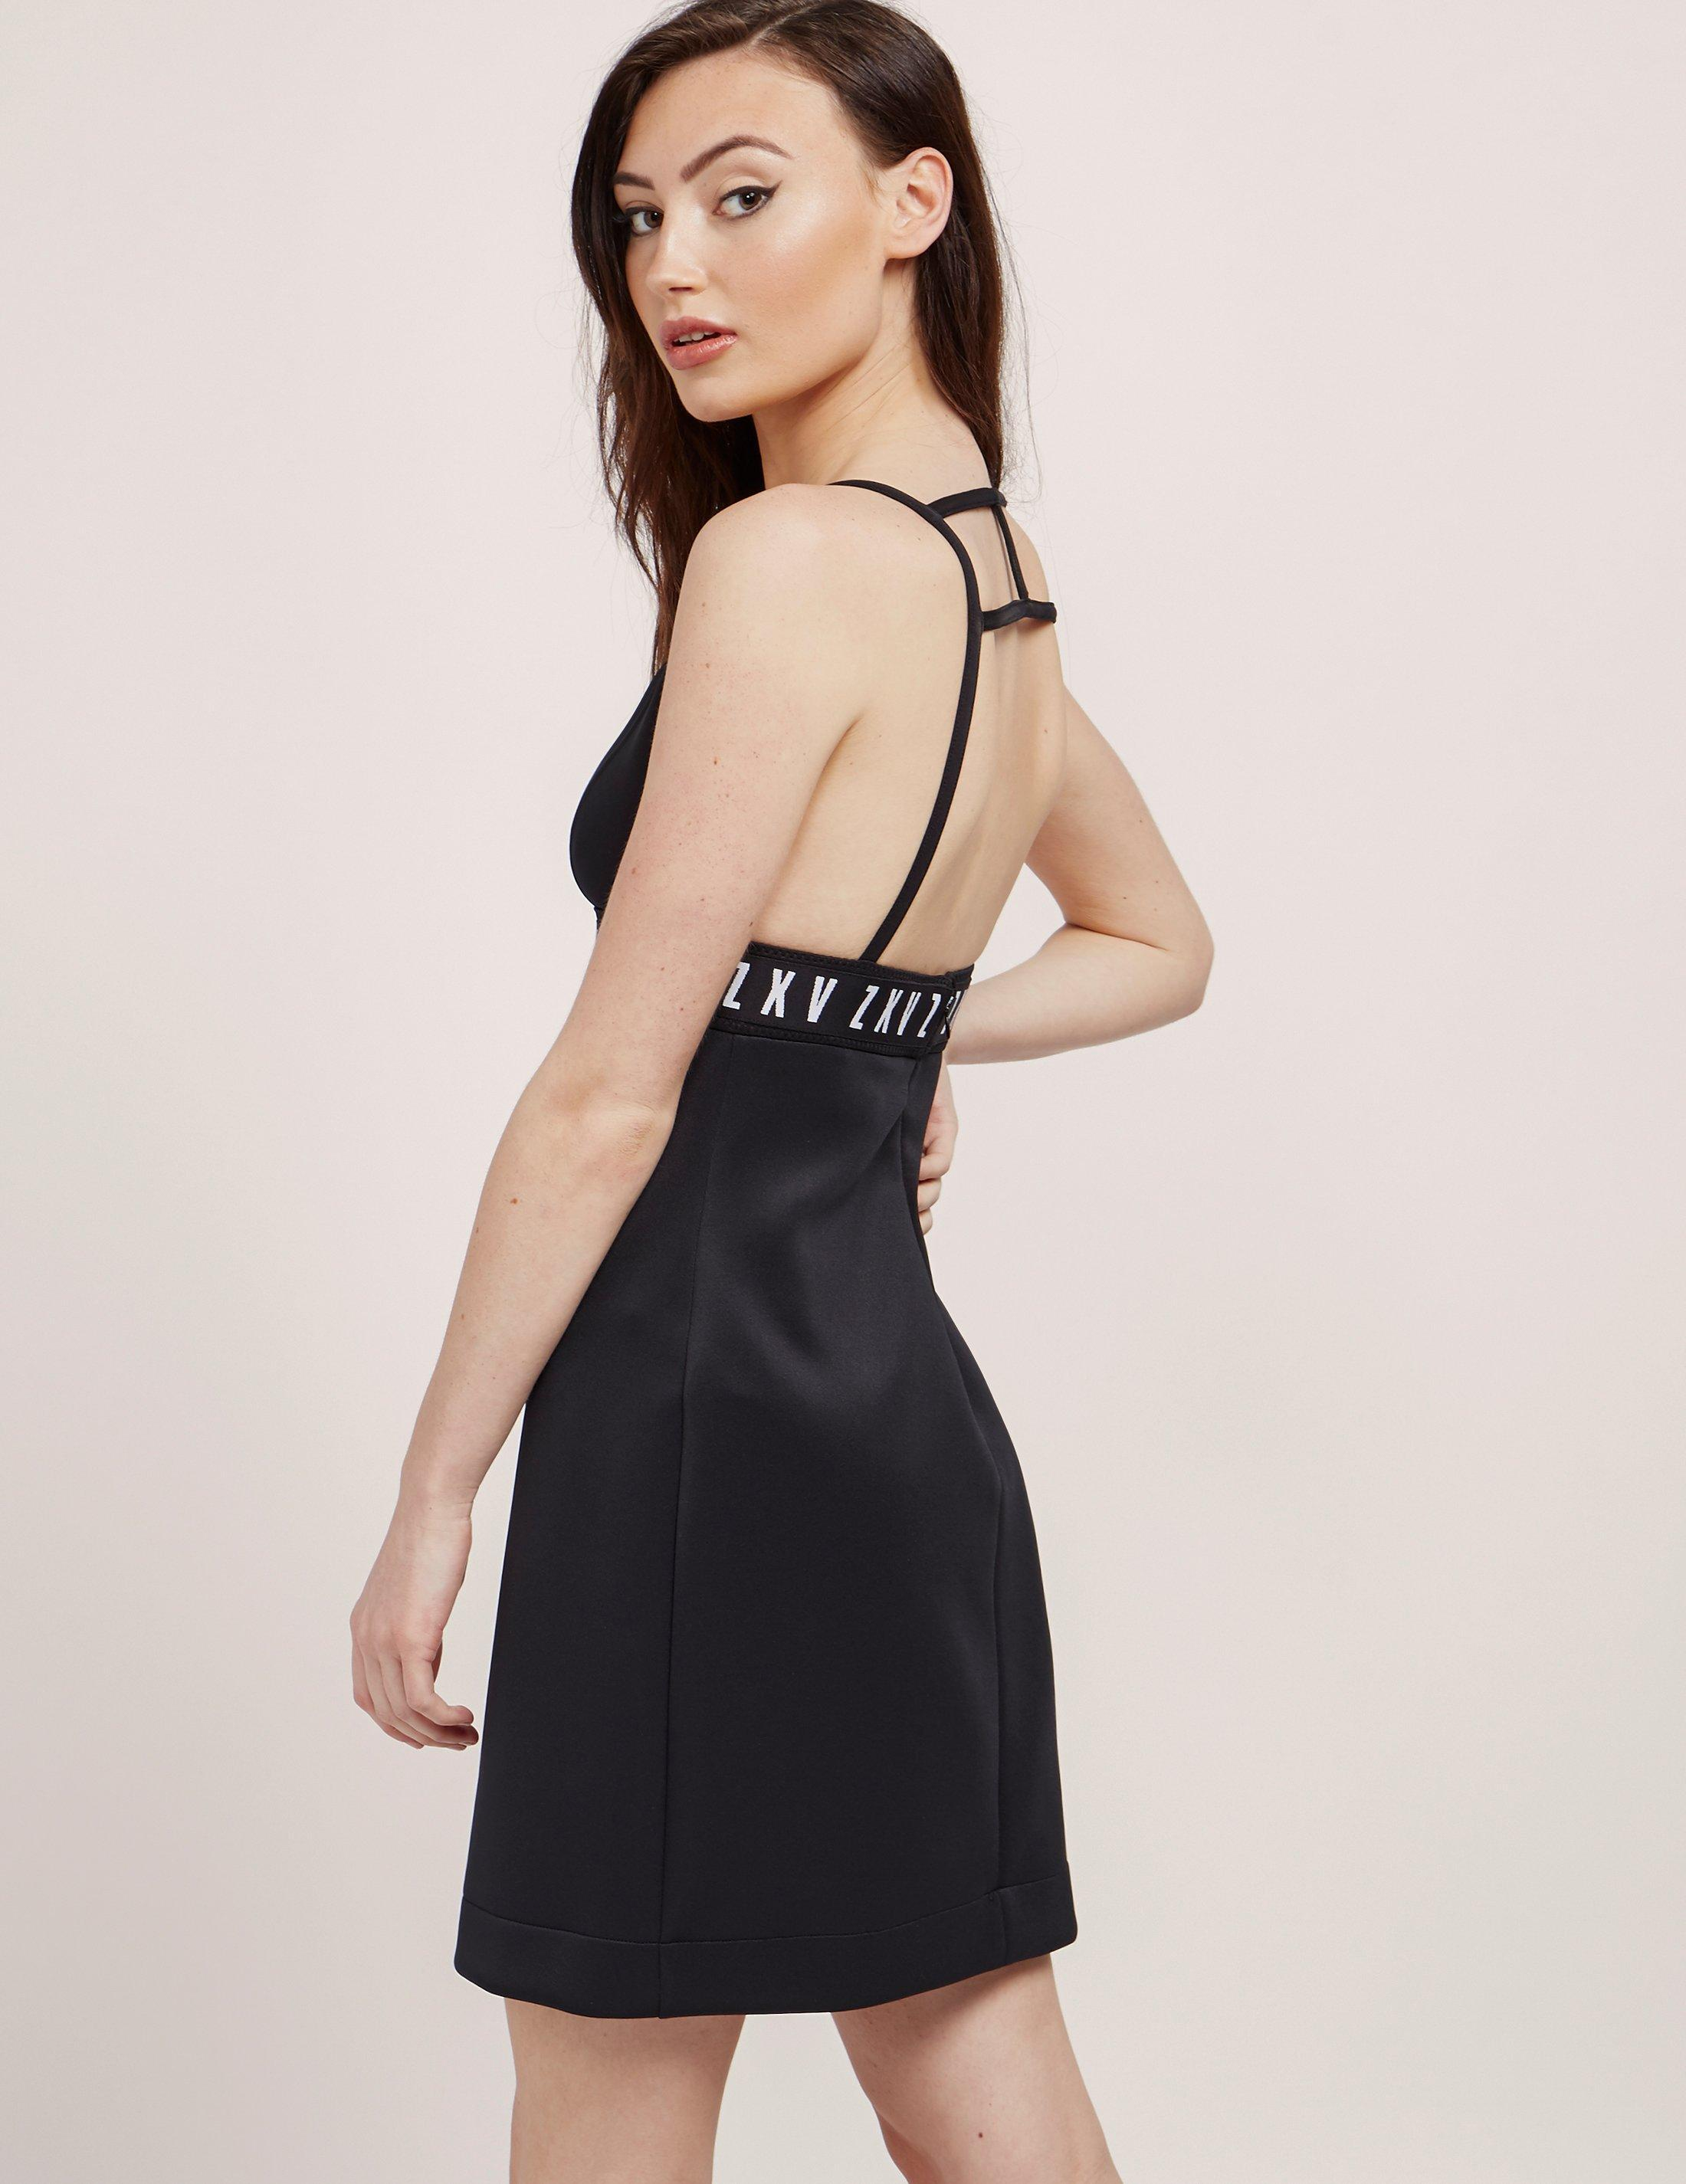 b84675cec8 Lyst - Versus Womens X Zayn Triangle Top Dress - Online Exclusive ...